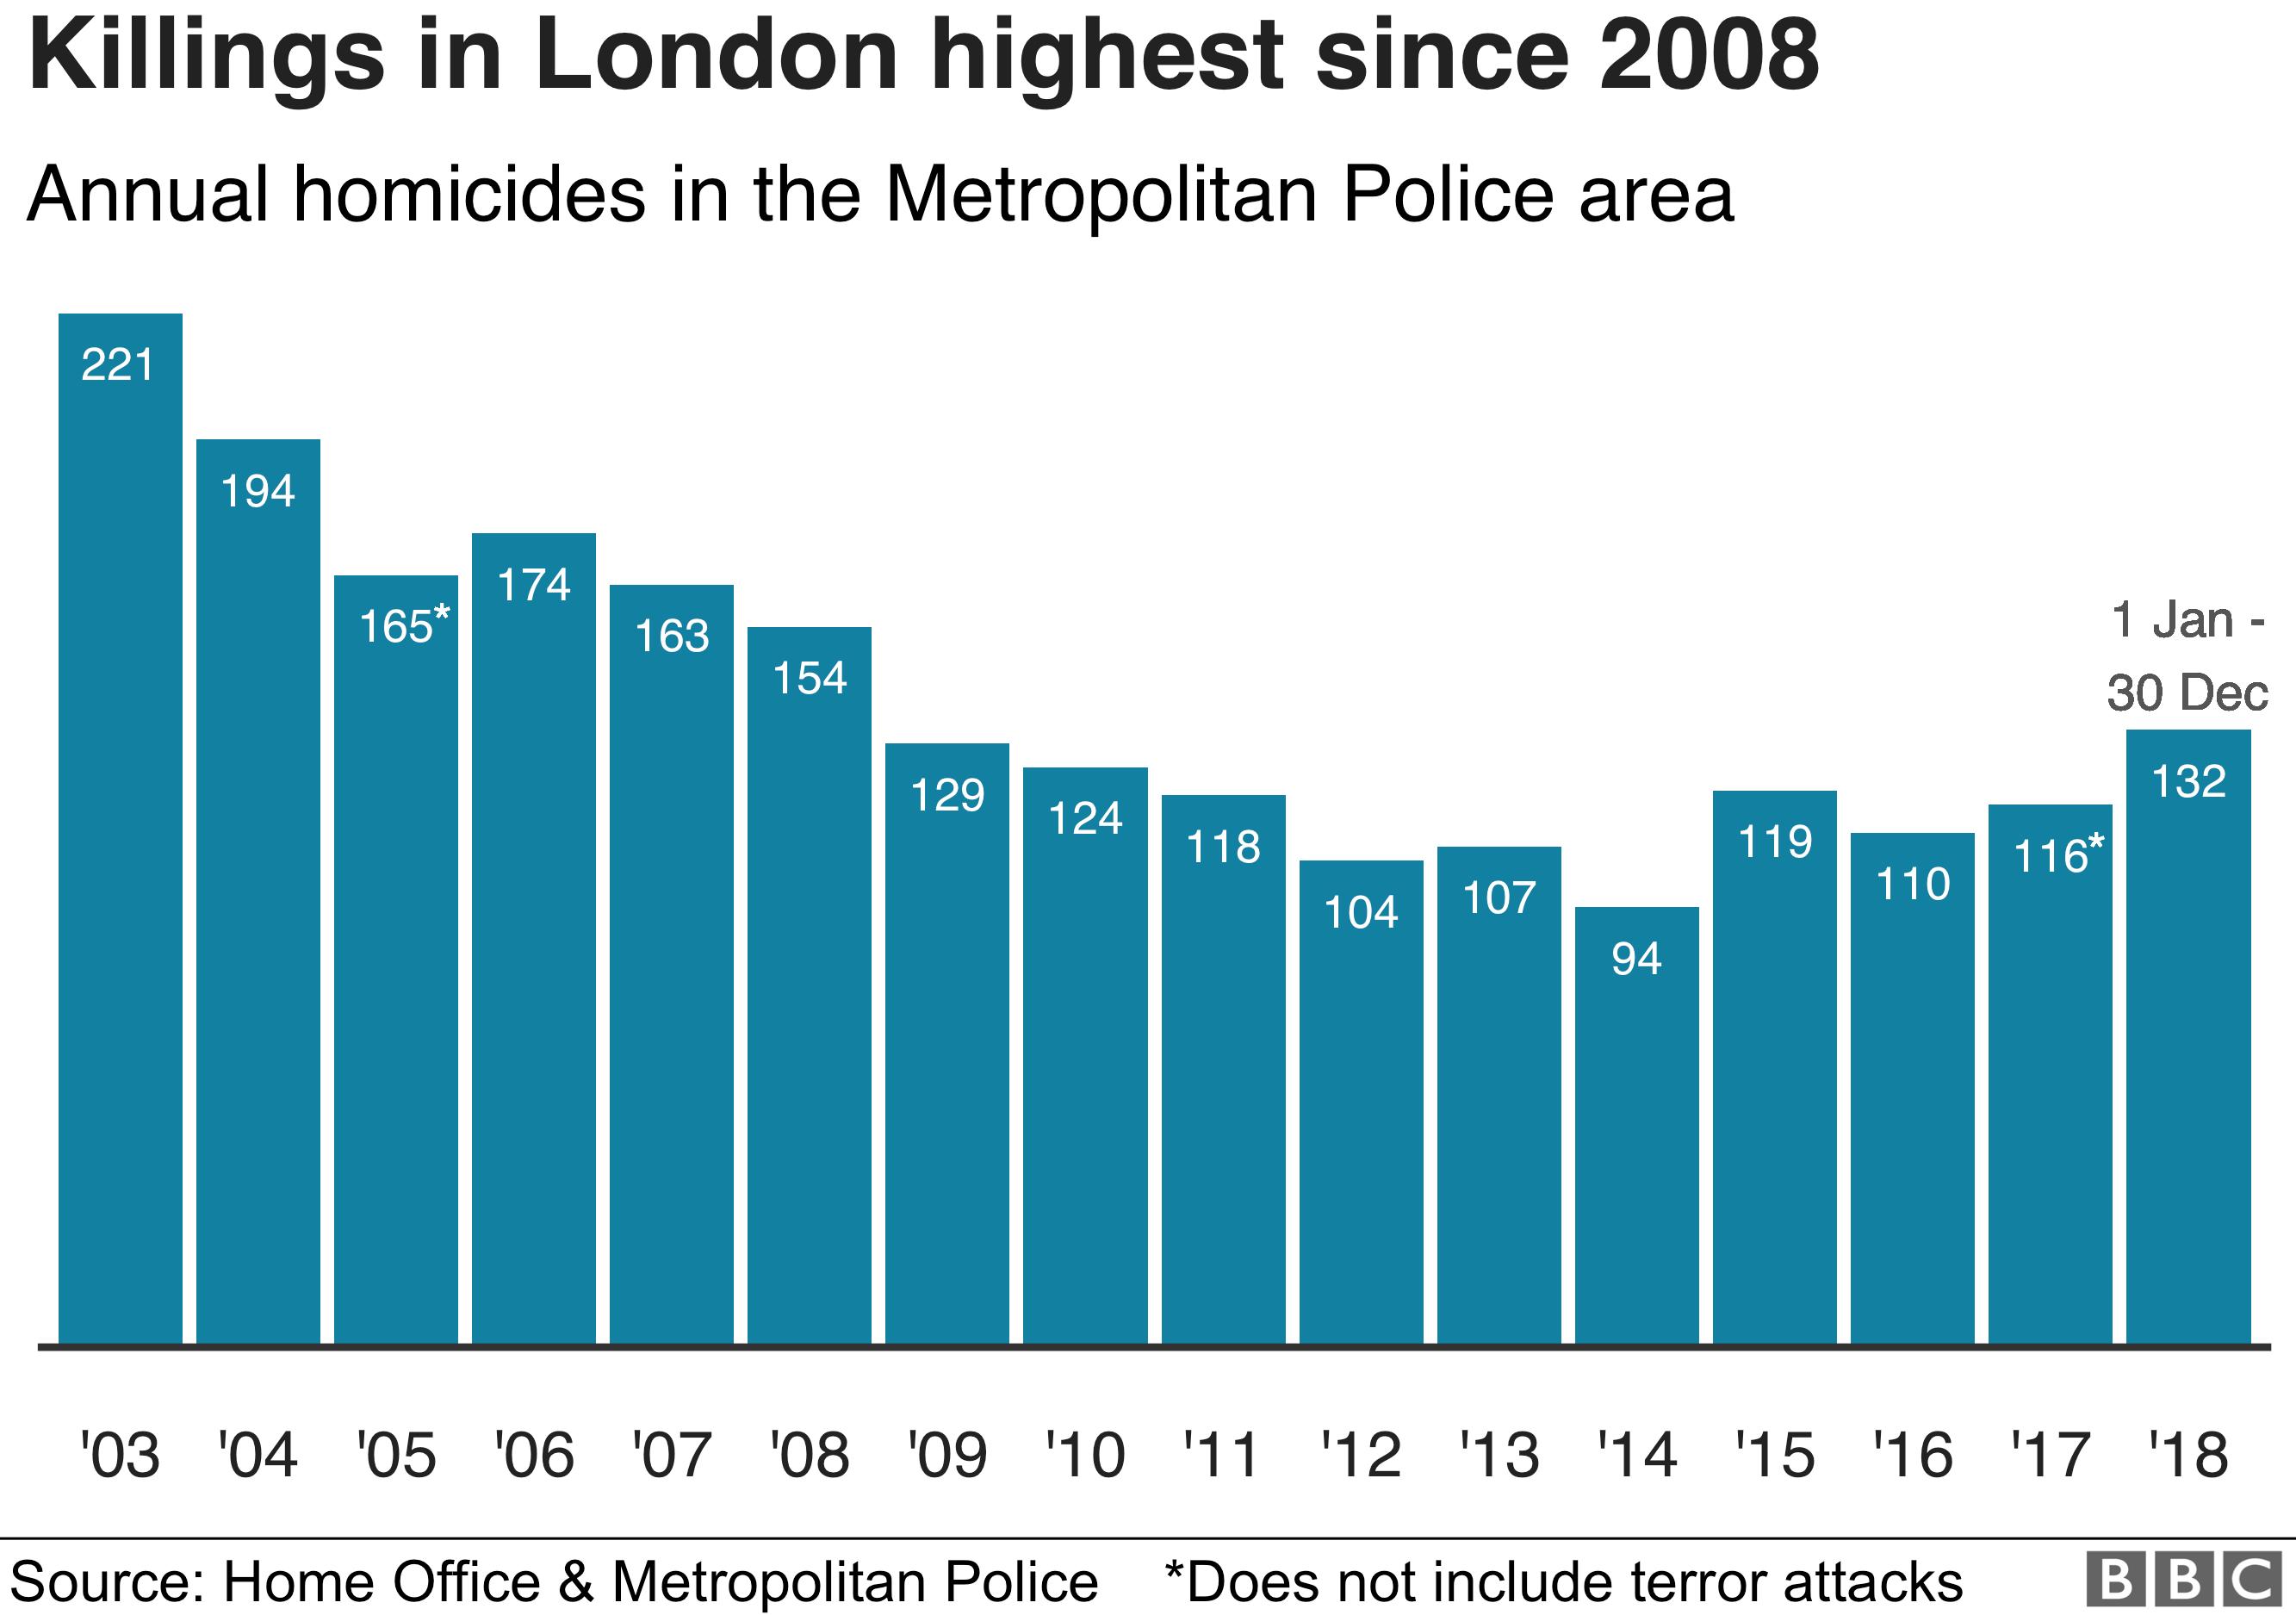 Killings in London between 2003 and 2008